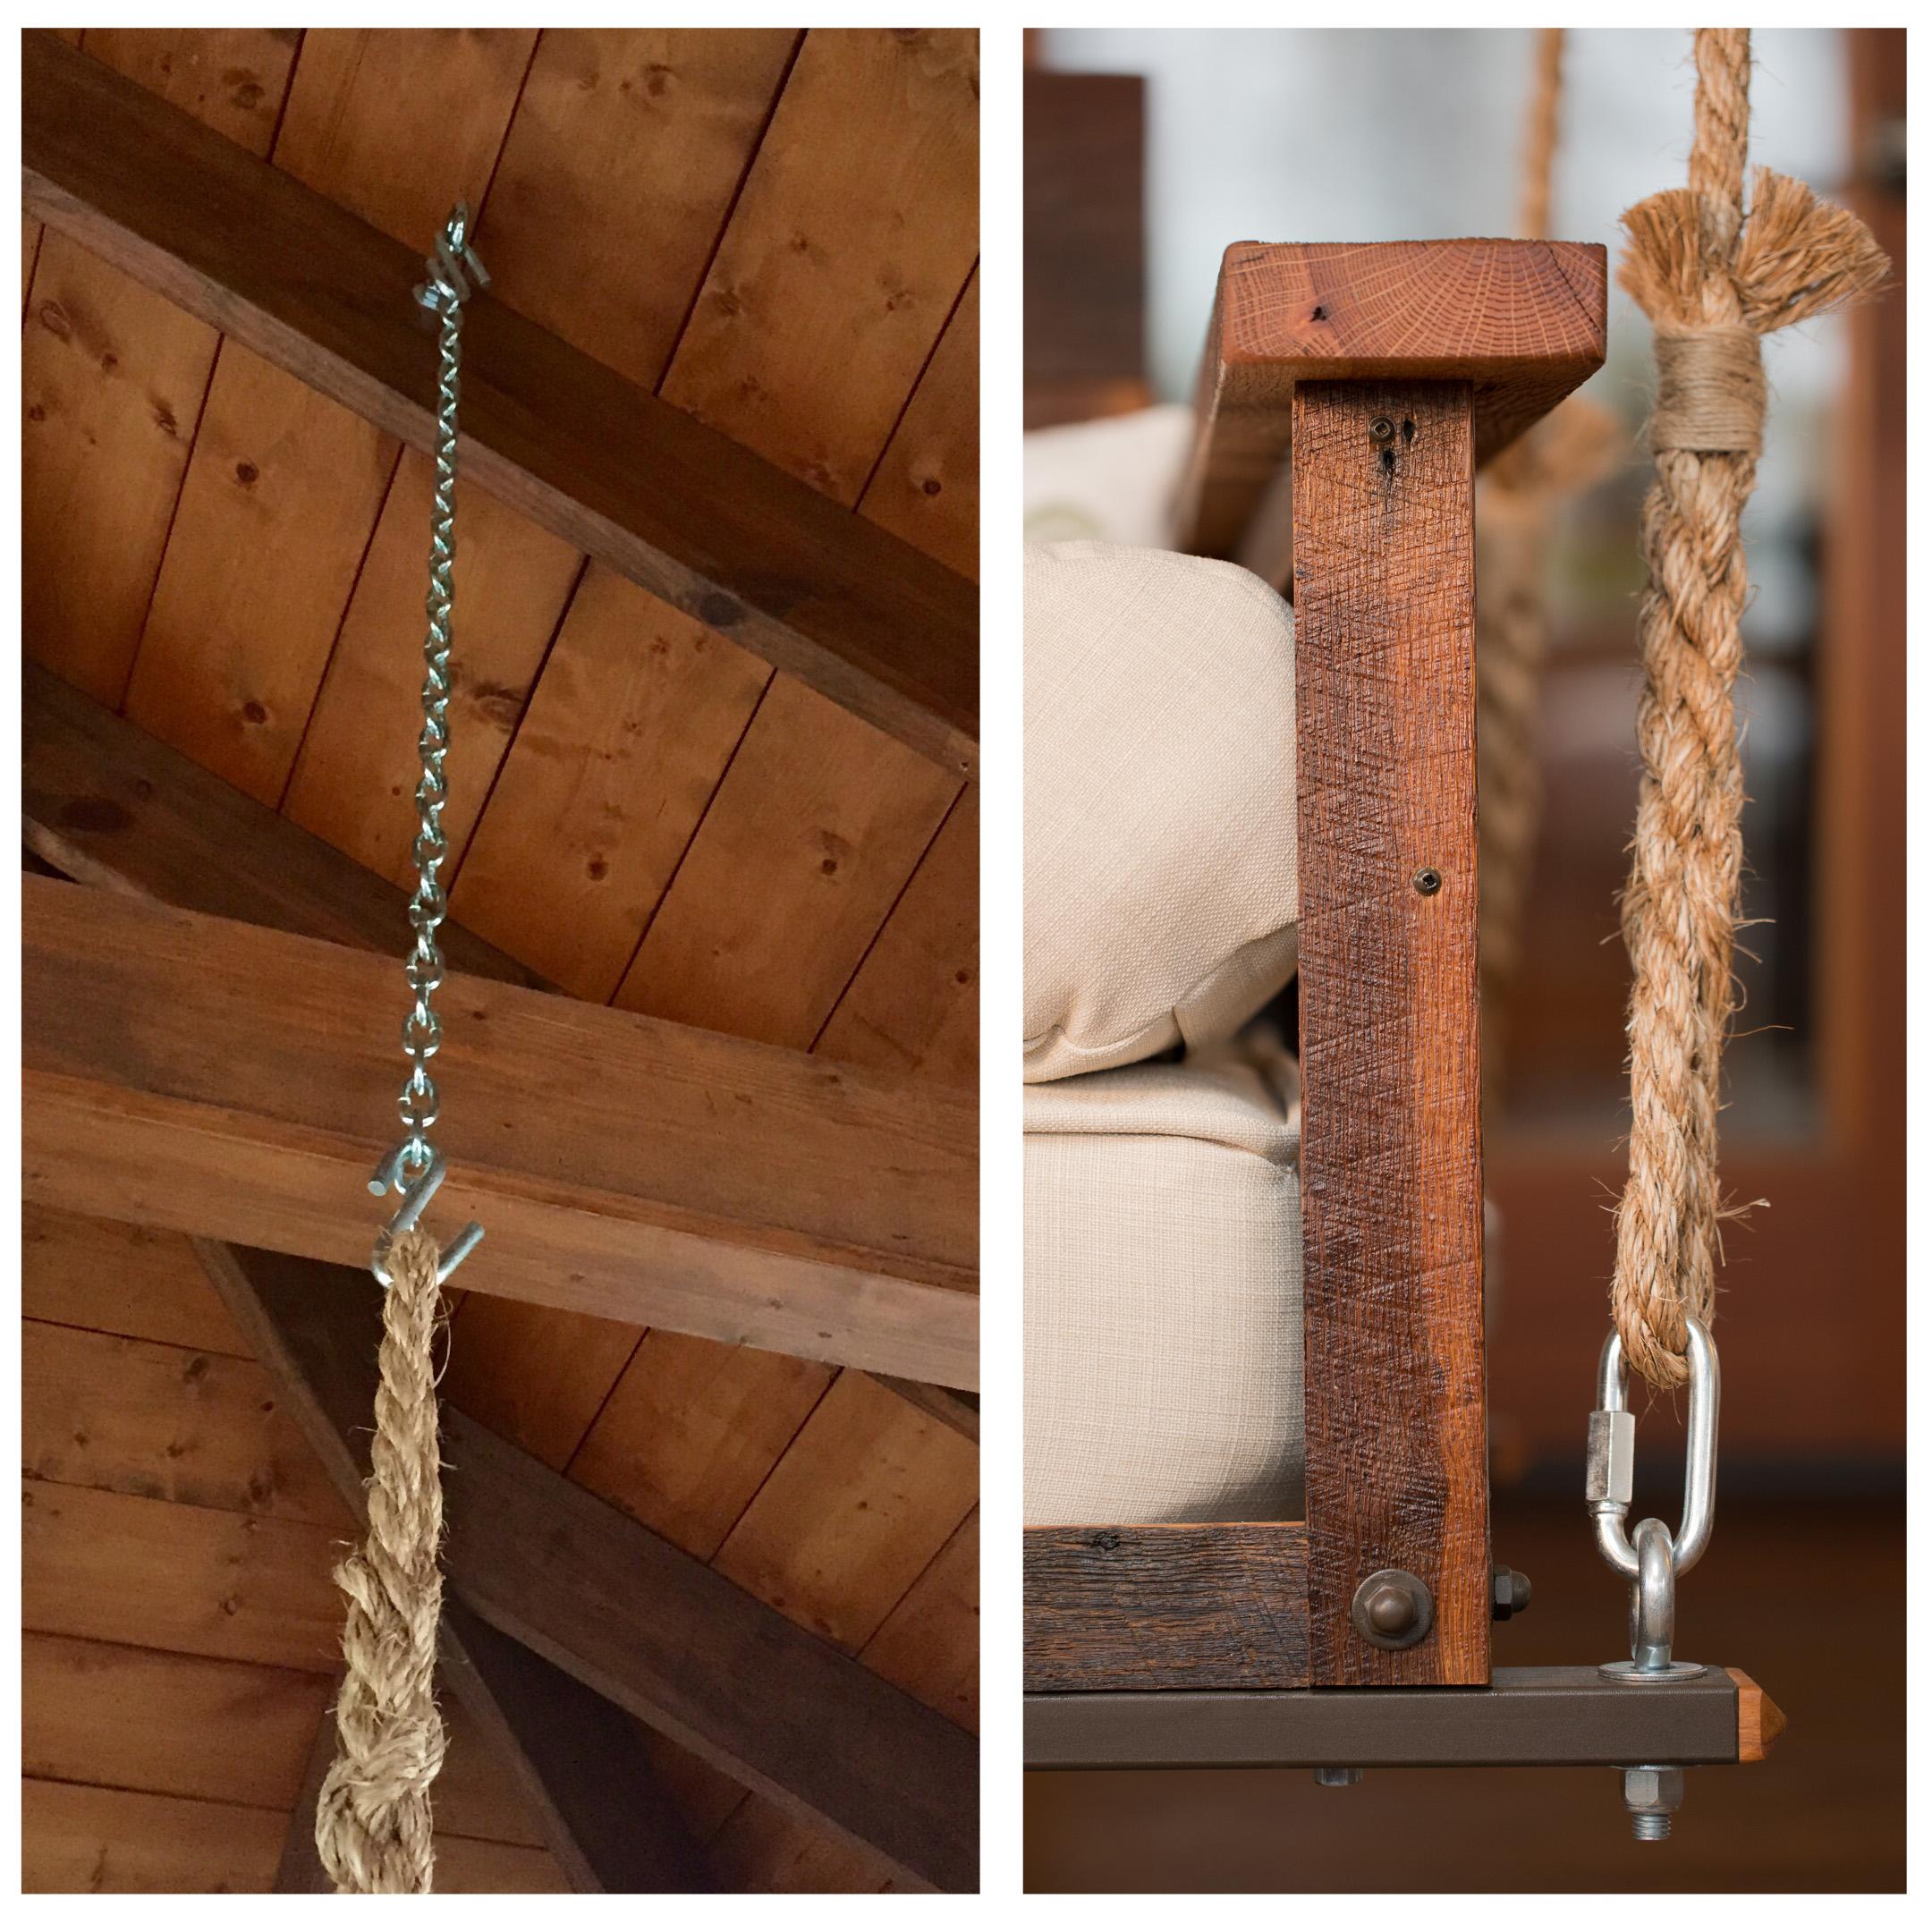 The Craftsman Pine Bed Swing Regarding Favorite Hanging Daybed Rope Porch Swings (Gallery 19 of 30)